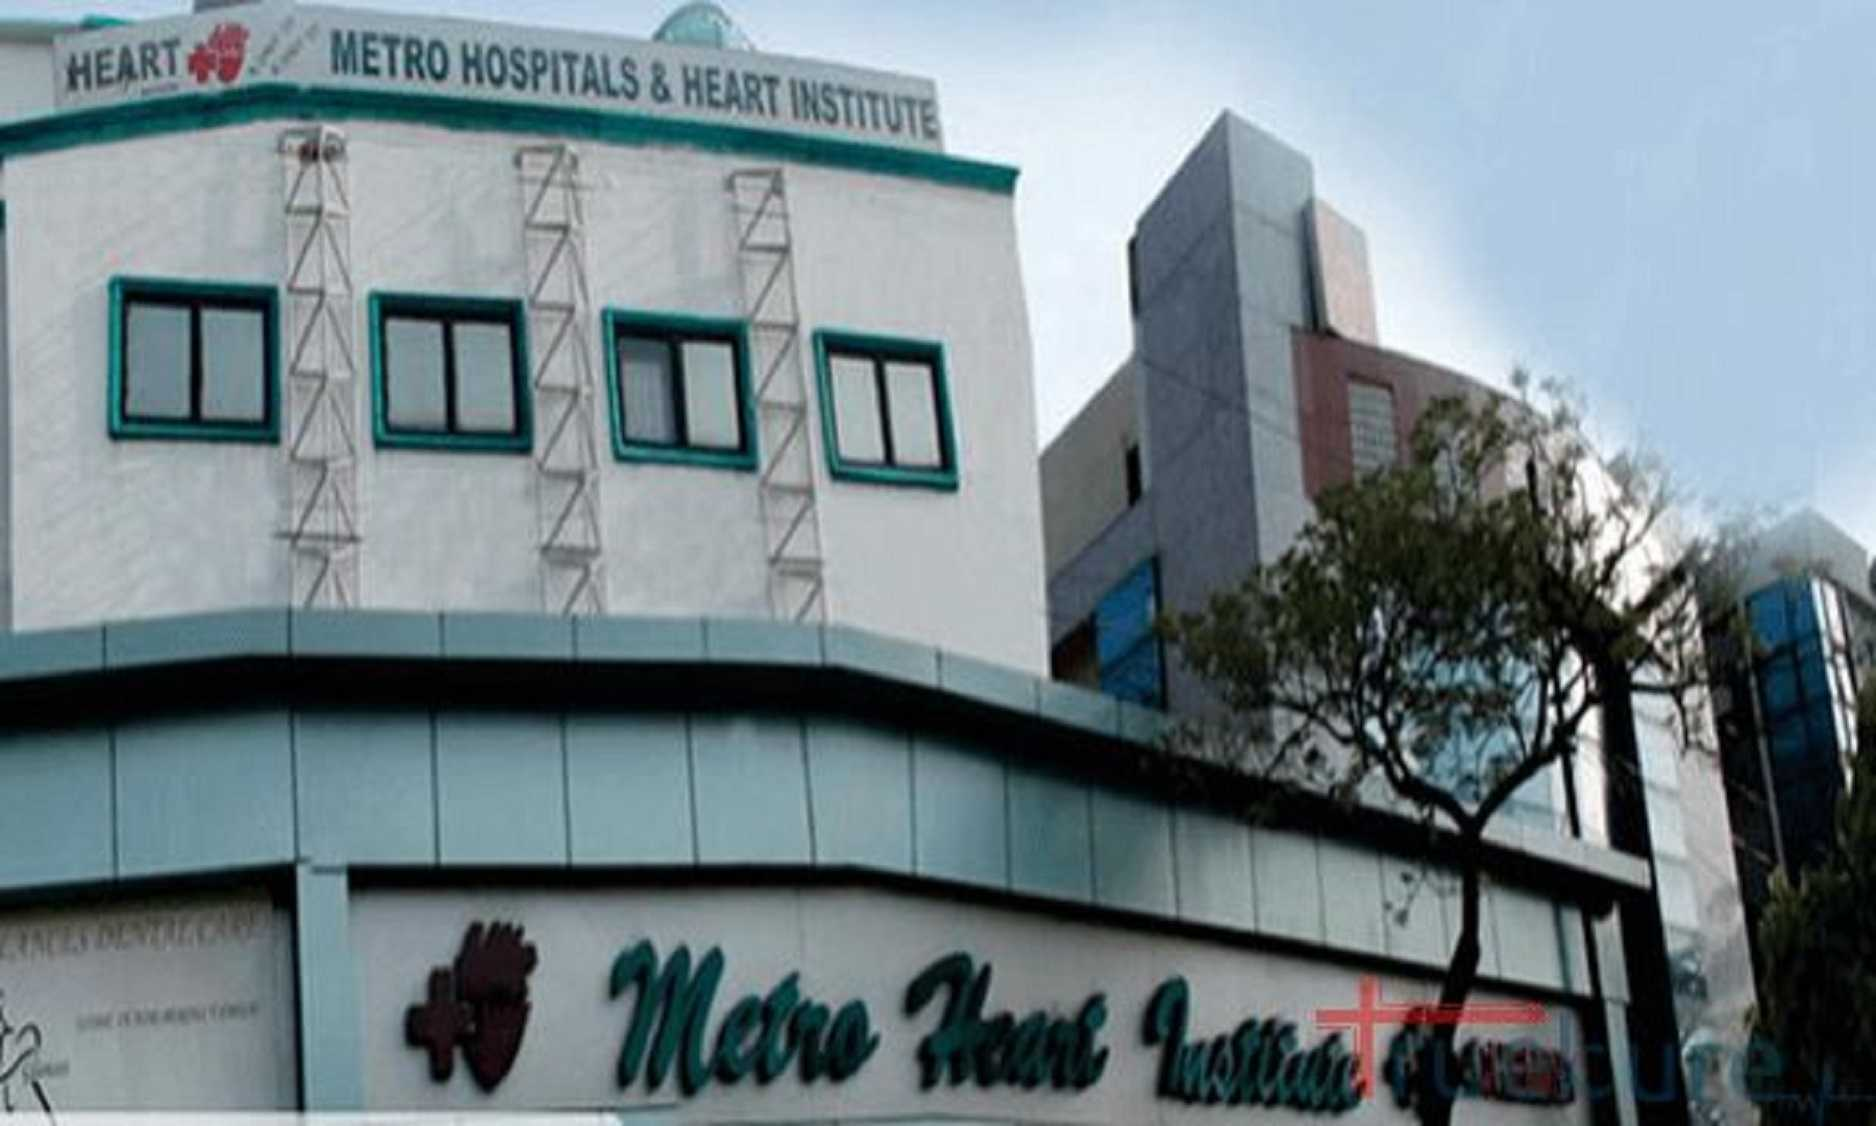 Metro hospital